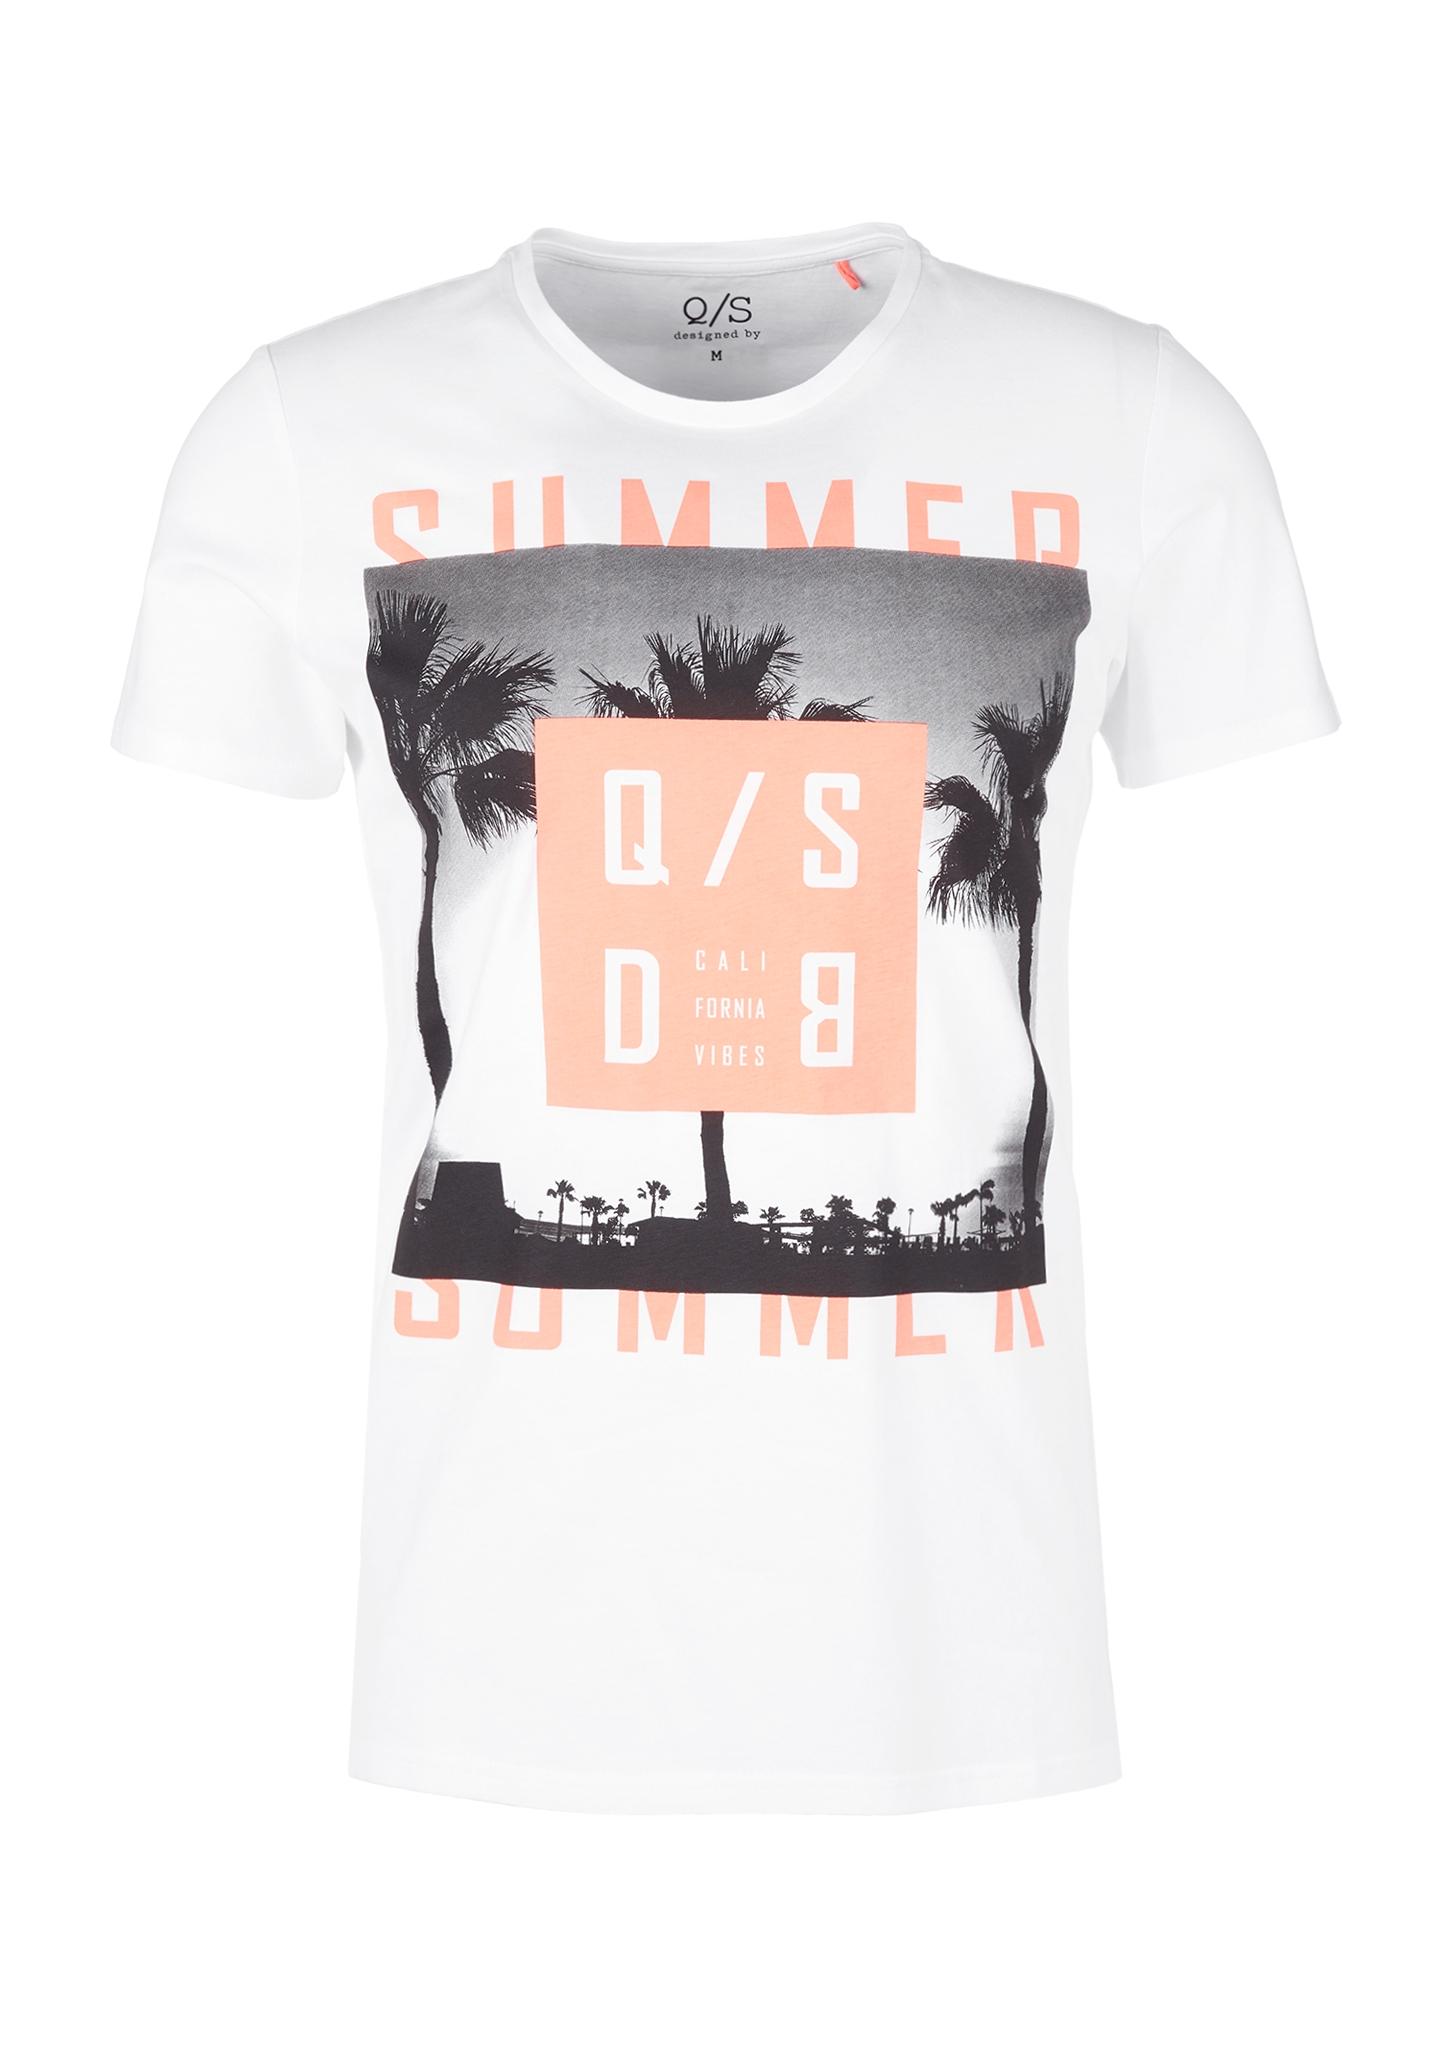 T-Shirt | Bekleidung > Shirts > Sonstige Shirts | Weiß | 65% polyester -  35% baumwolle | Q/S designed by